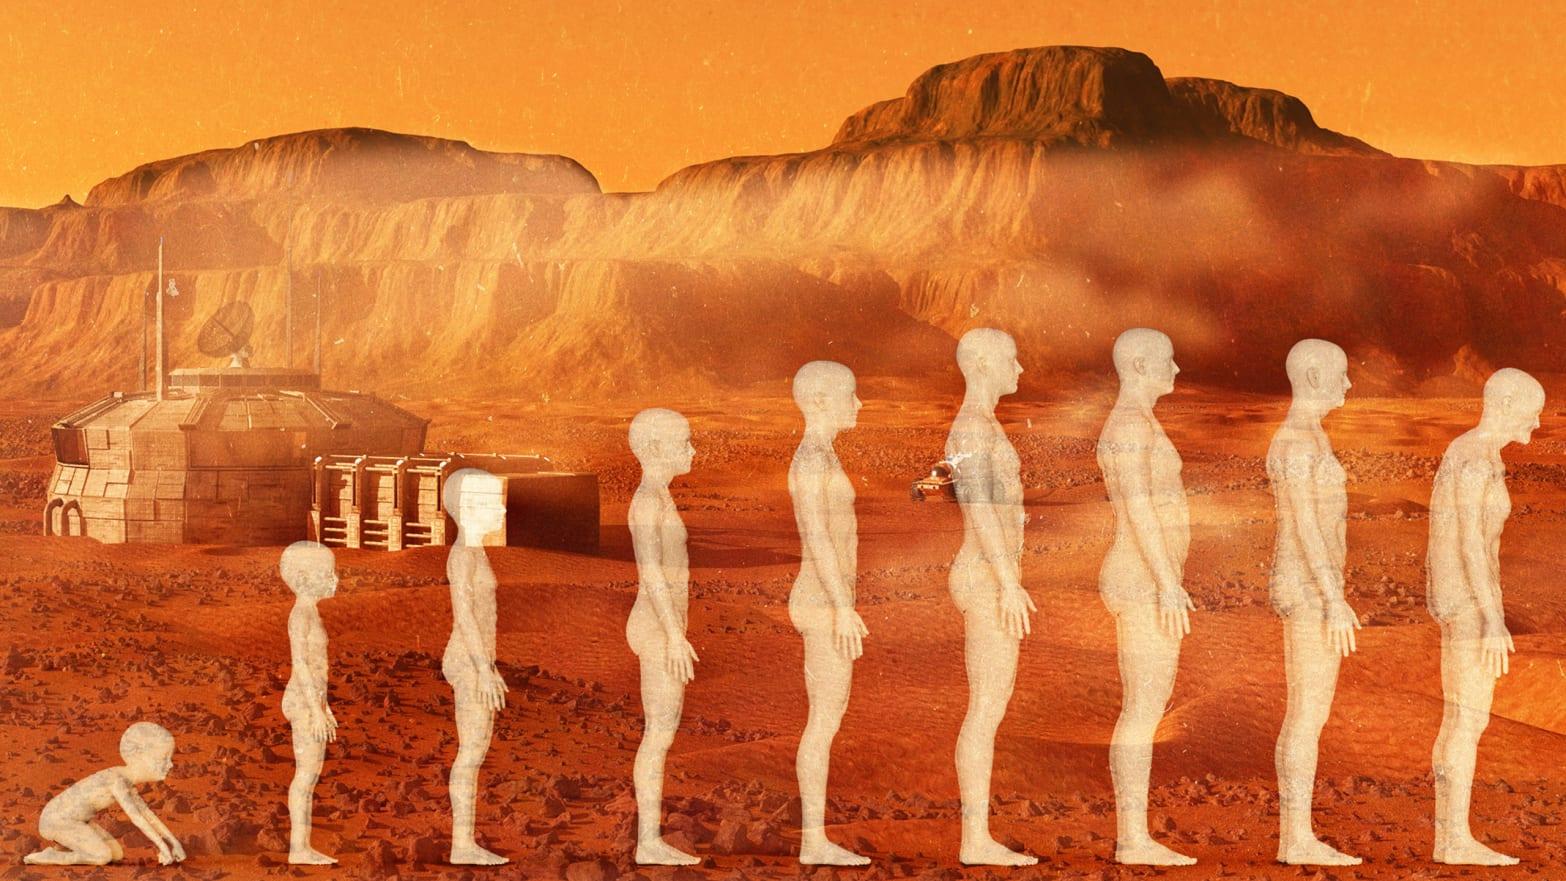 mars evolution evolve gorilla curiosity rover gale crater red planet martian